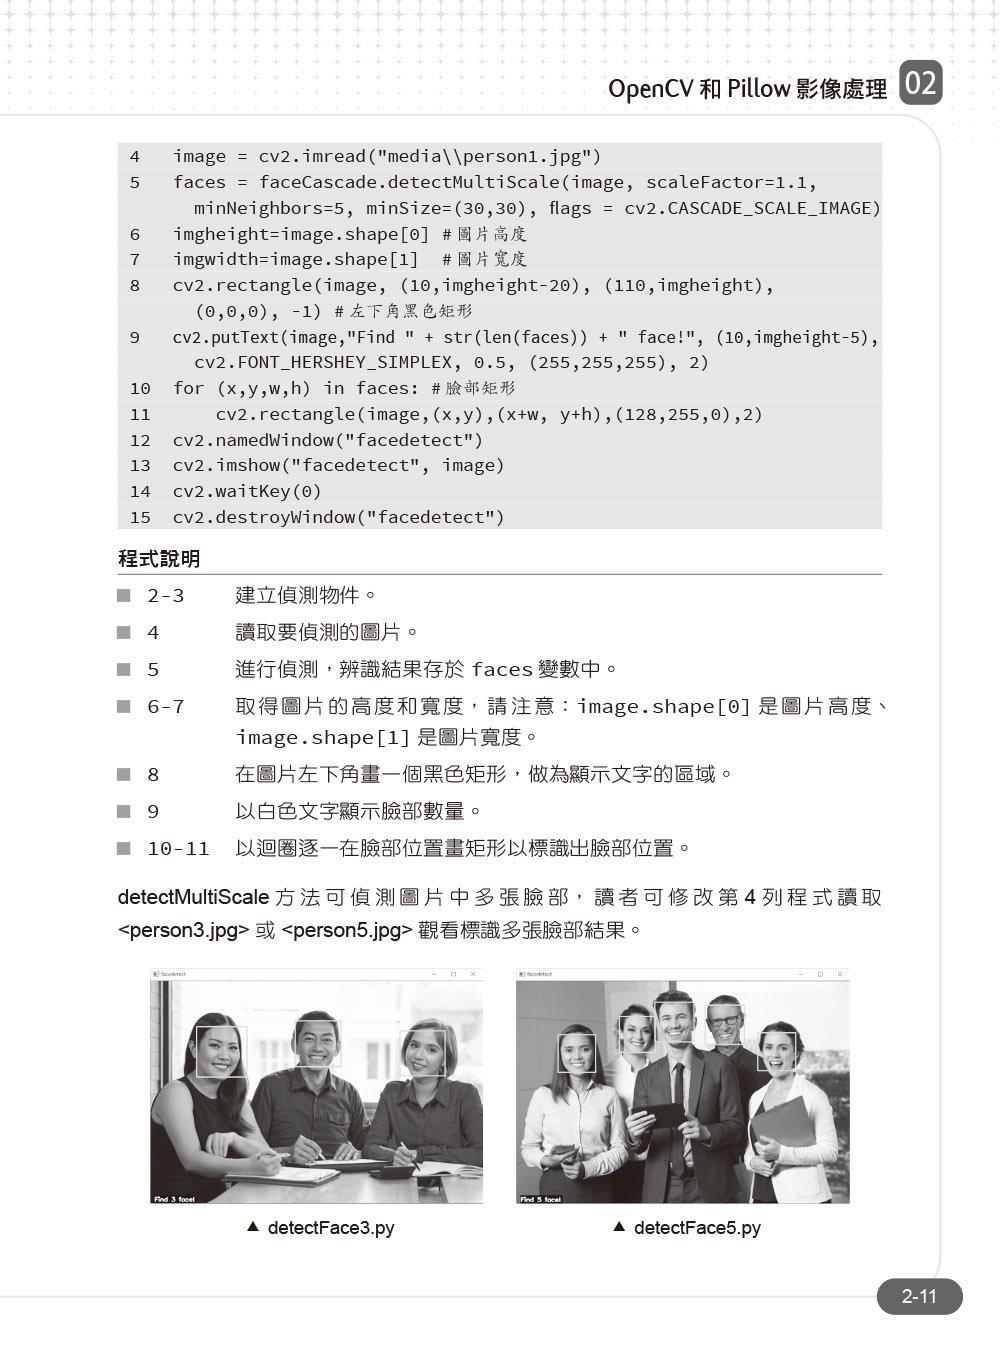 Python 機器學習超進化:AI影像辨識跨界應用實戰 (附100分鐘影像處理入門影音教學/範例程式)-preview-2